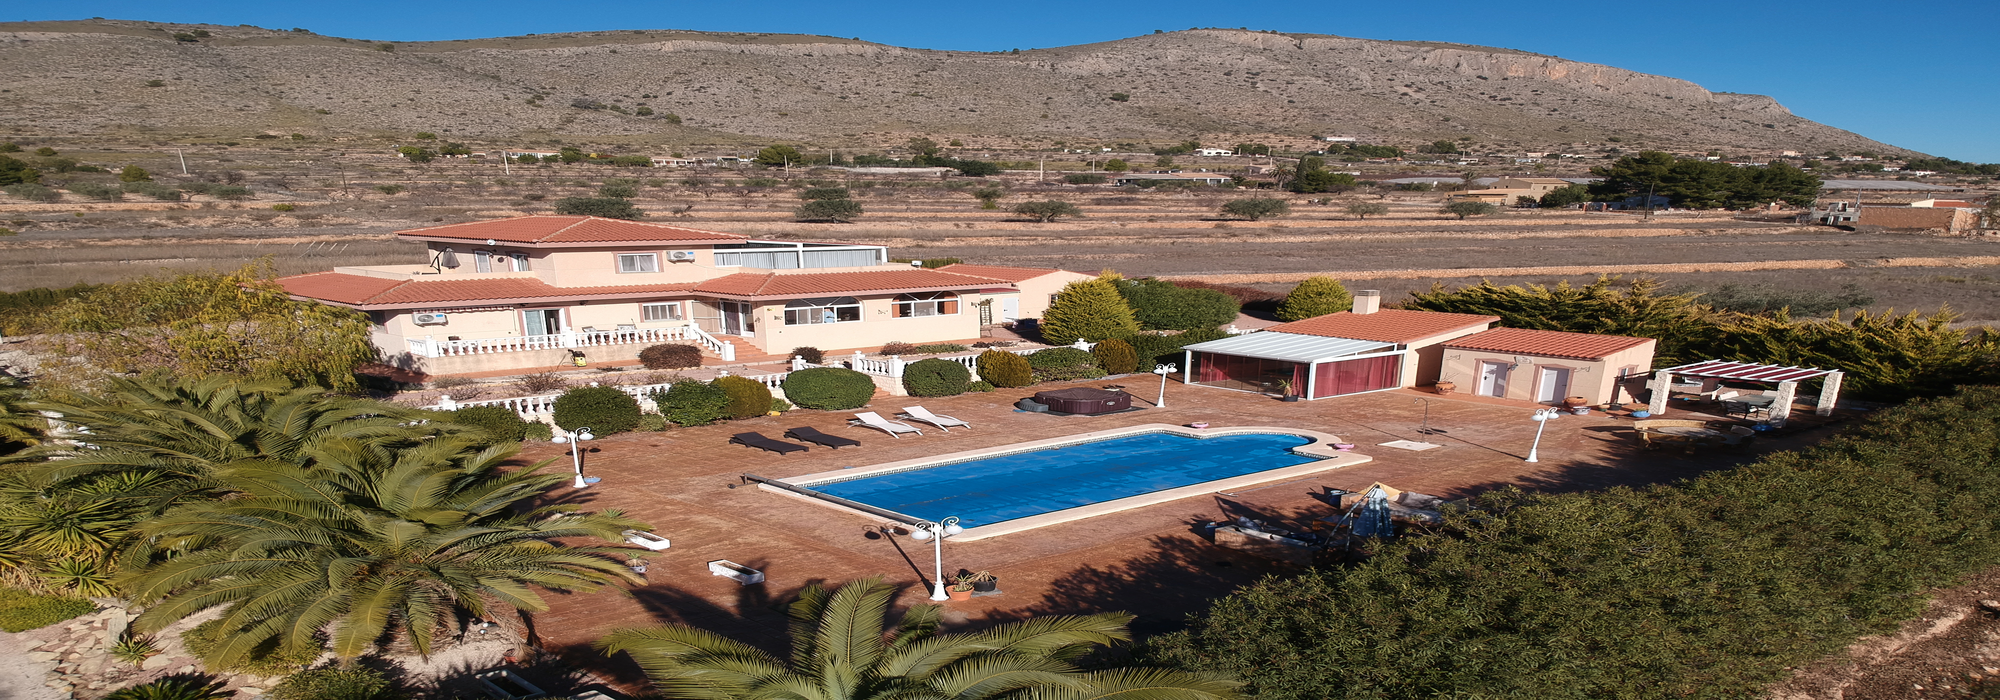 Fabulous 4 Bedroom Villa With Amazing Gardens And Salt Water Pool